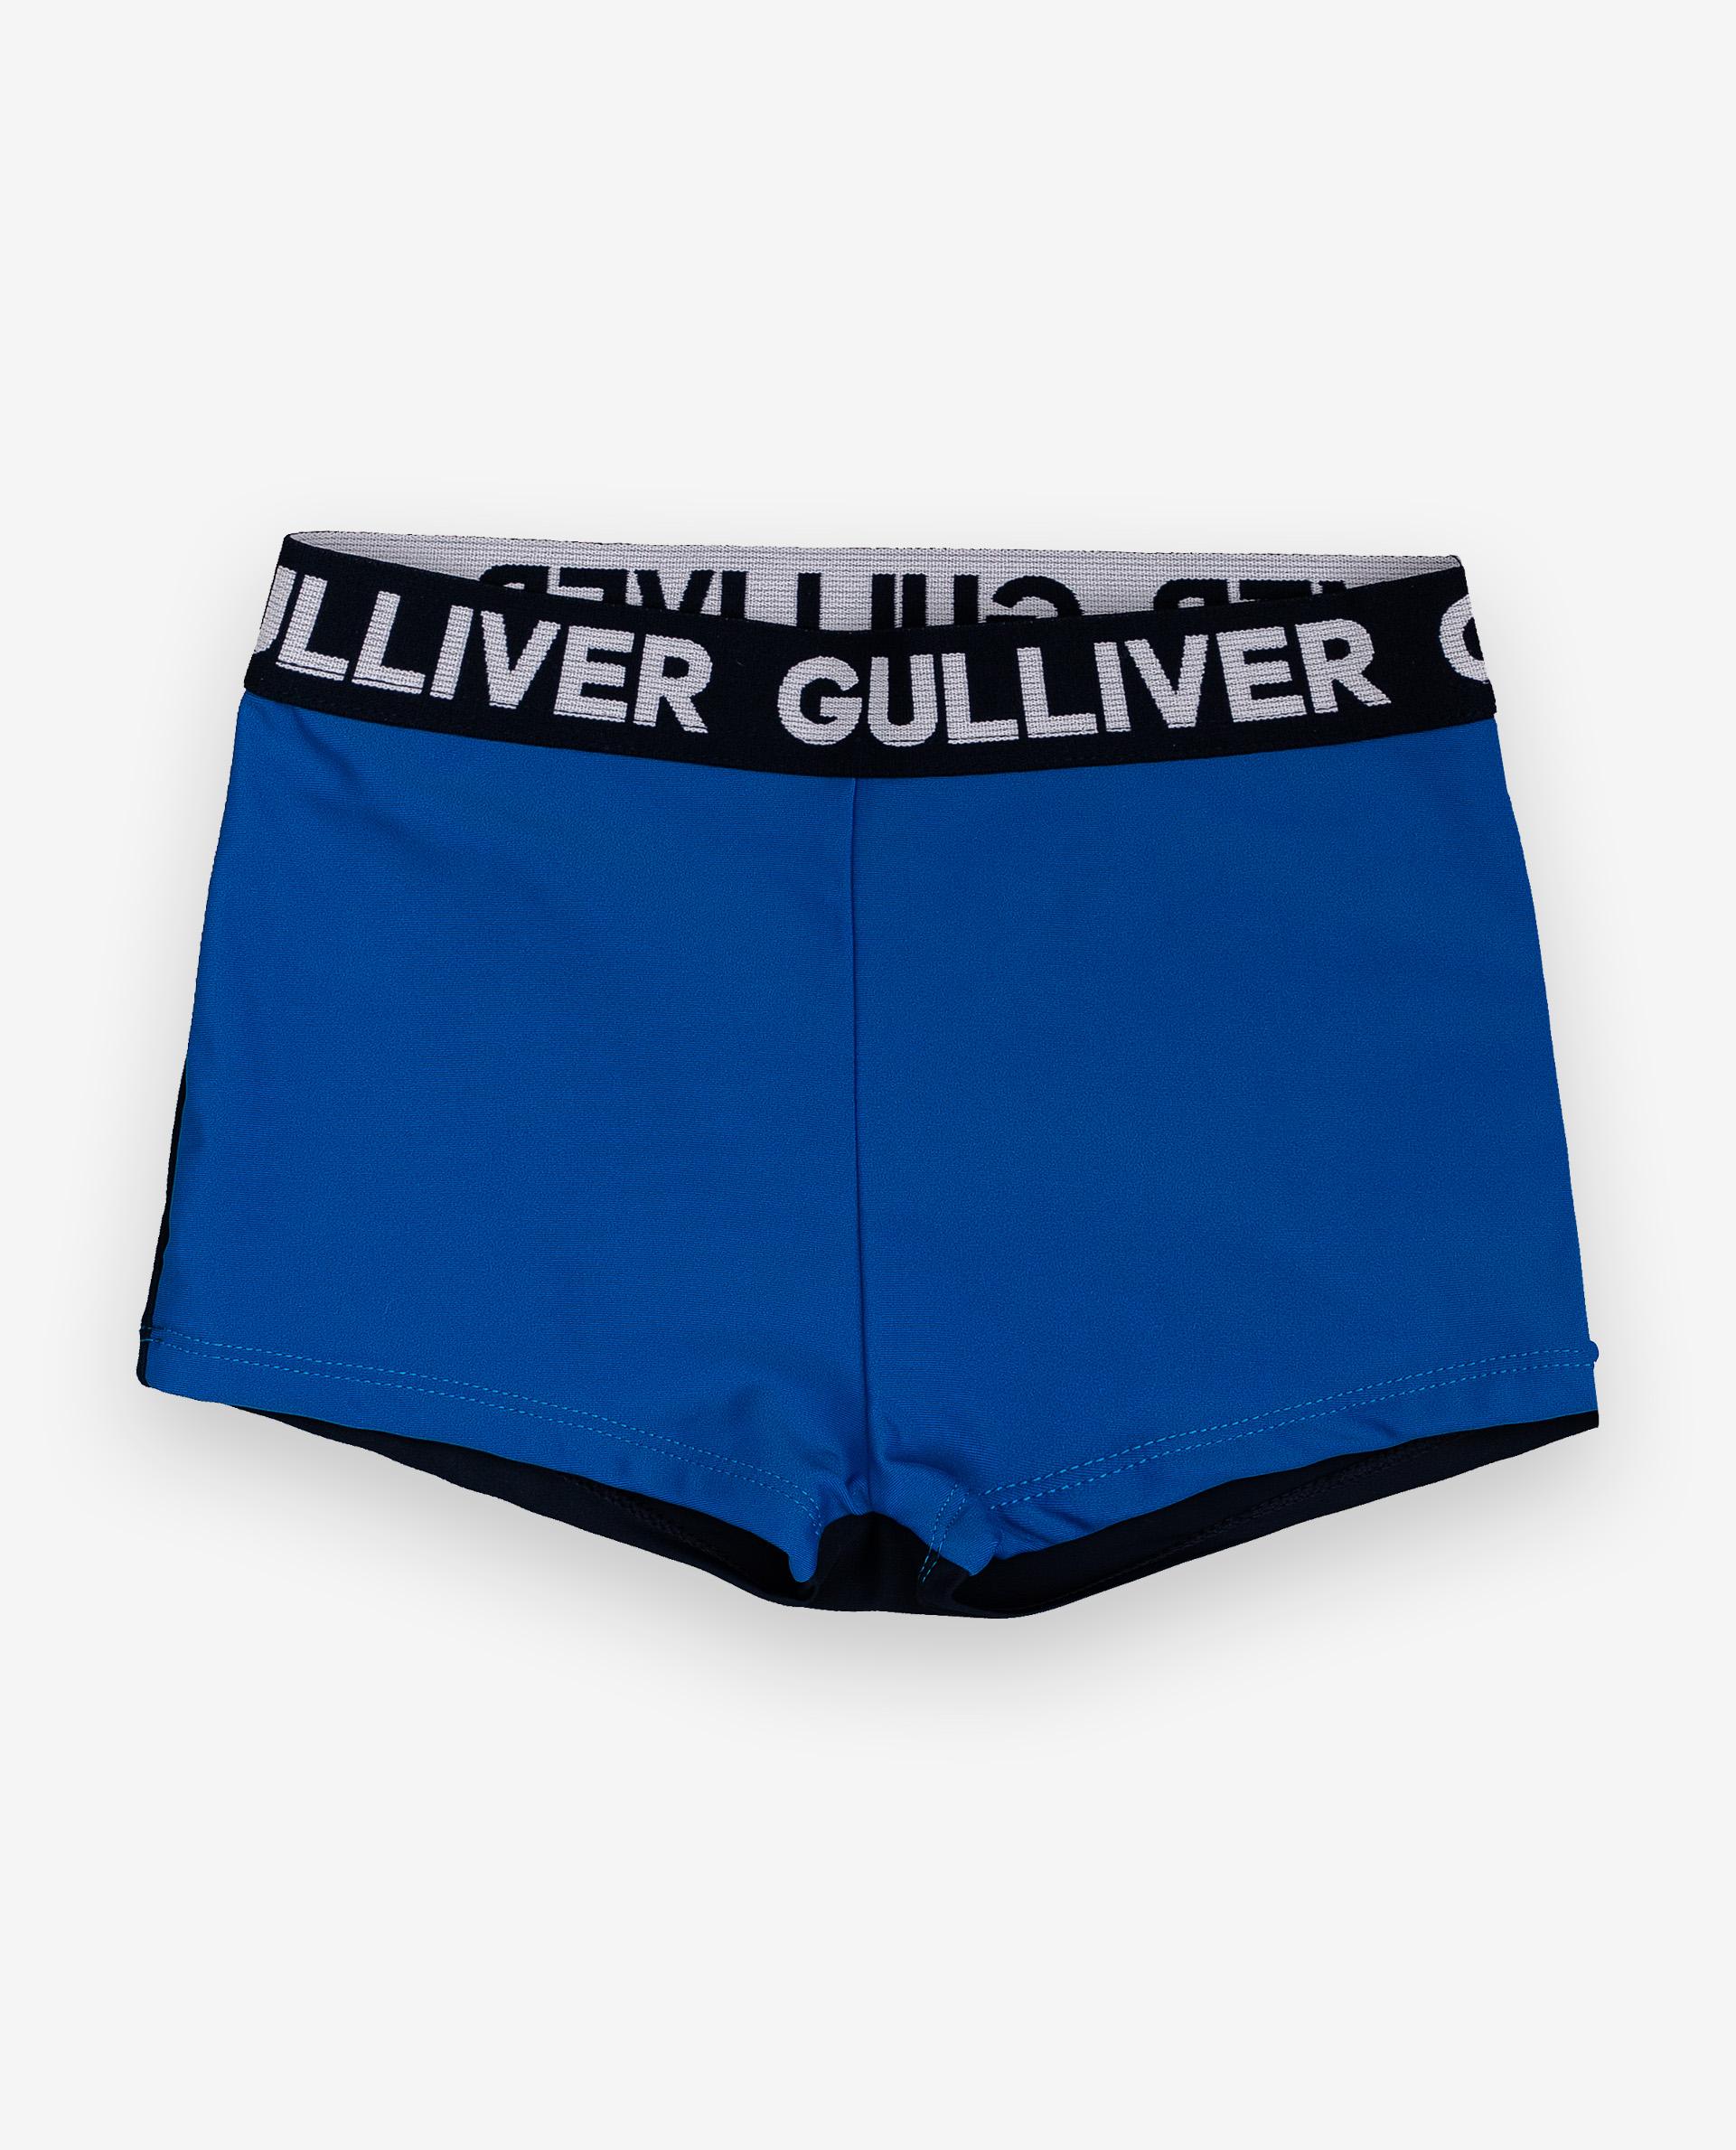 Плавки для мальчиков Gulliver, цв. синий, р.110